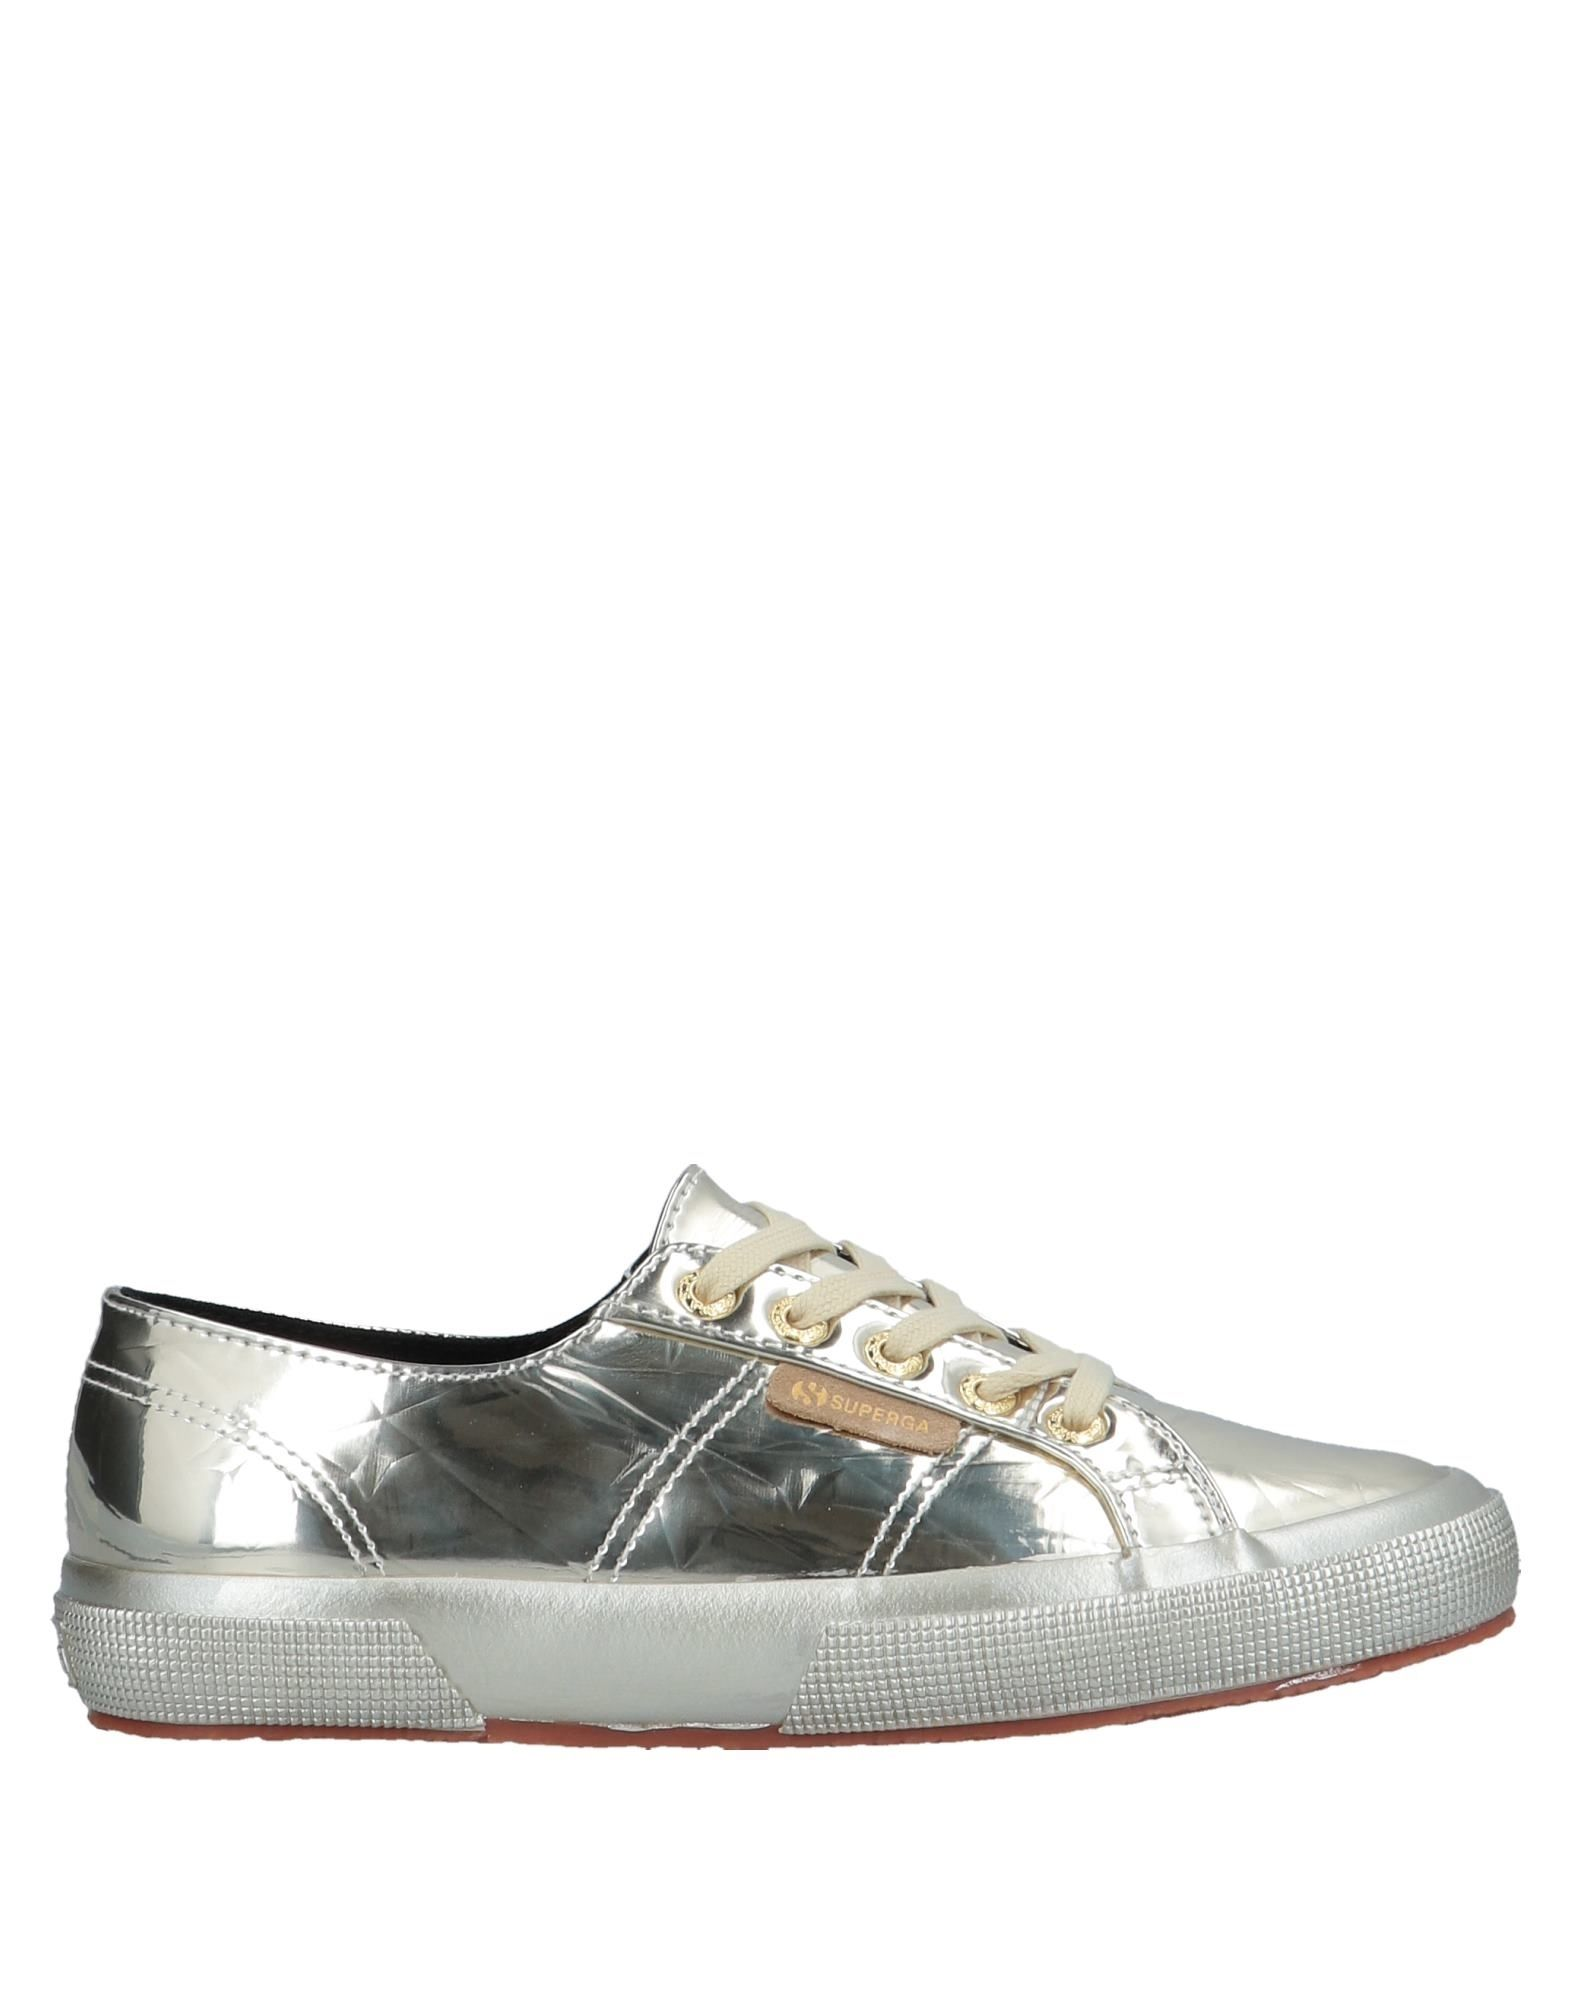 Superga® Sneakers - Women Superga® Sneakers online on 11571108UW  United Kingdom - 11571108UW on 4f403b